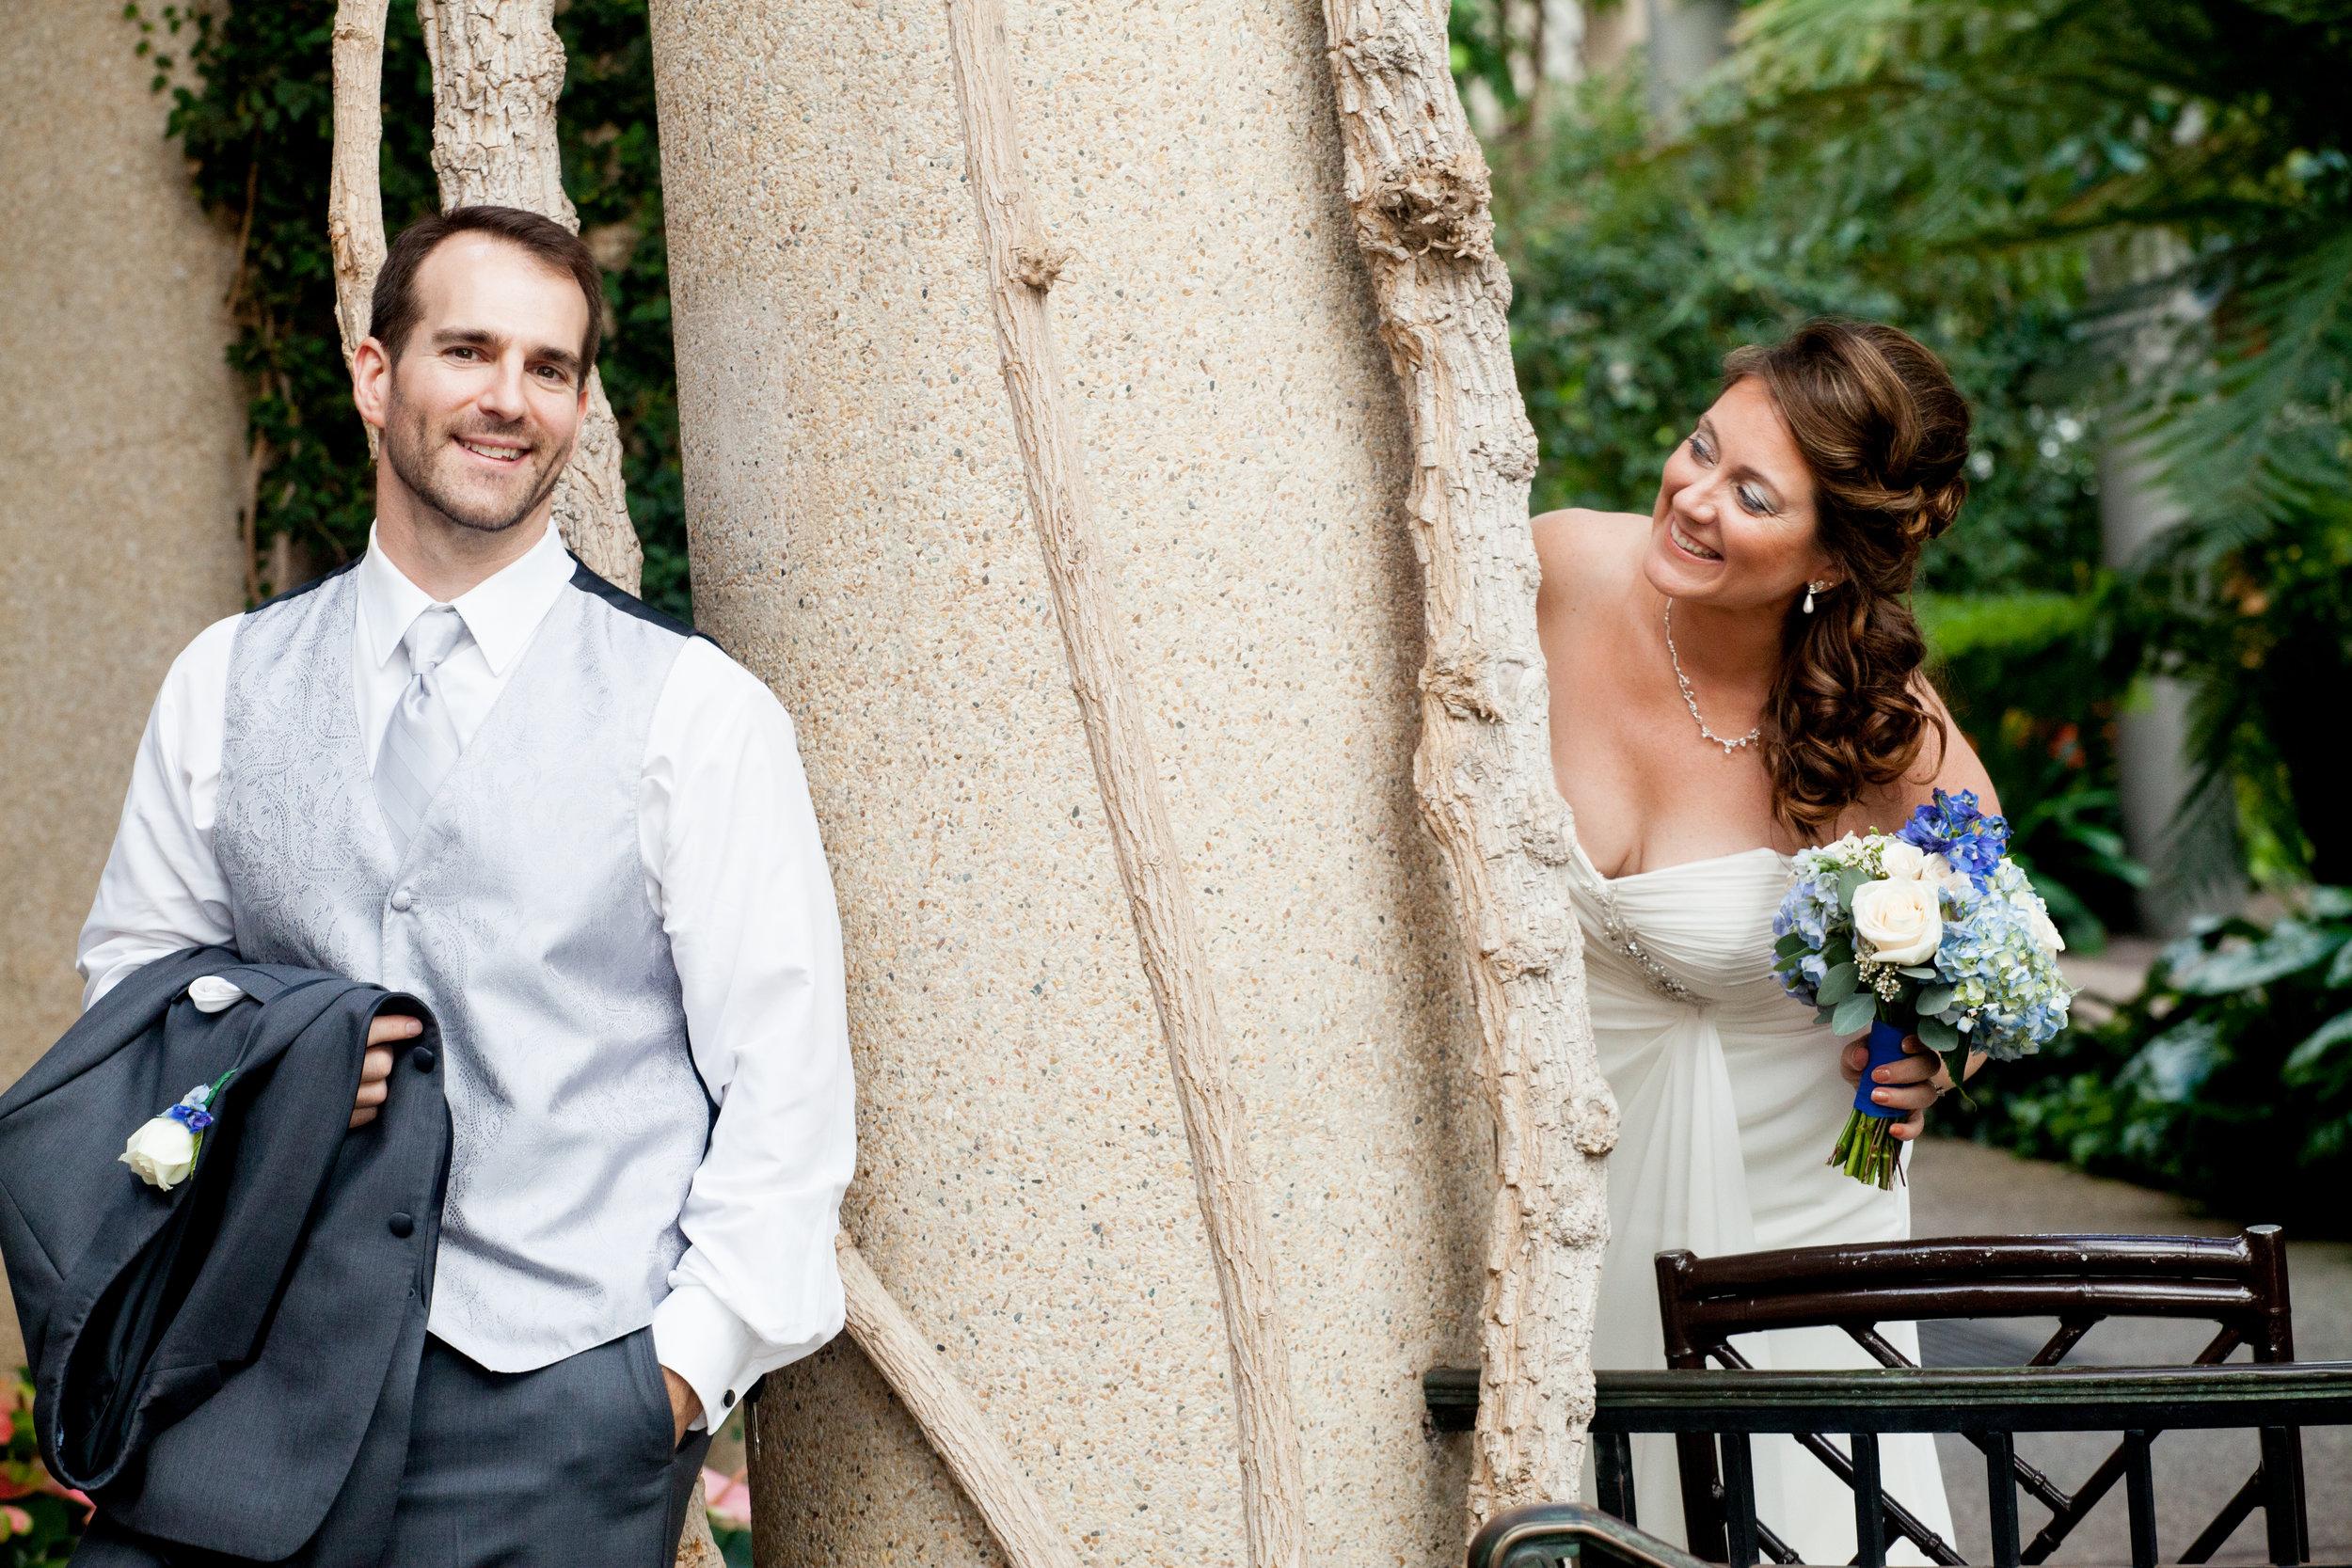 3-27-2015_Errol Ebanks_Gregory and Angela Herbstritt Wedding_341.jpg